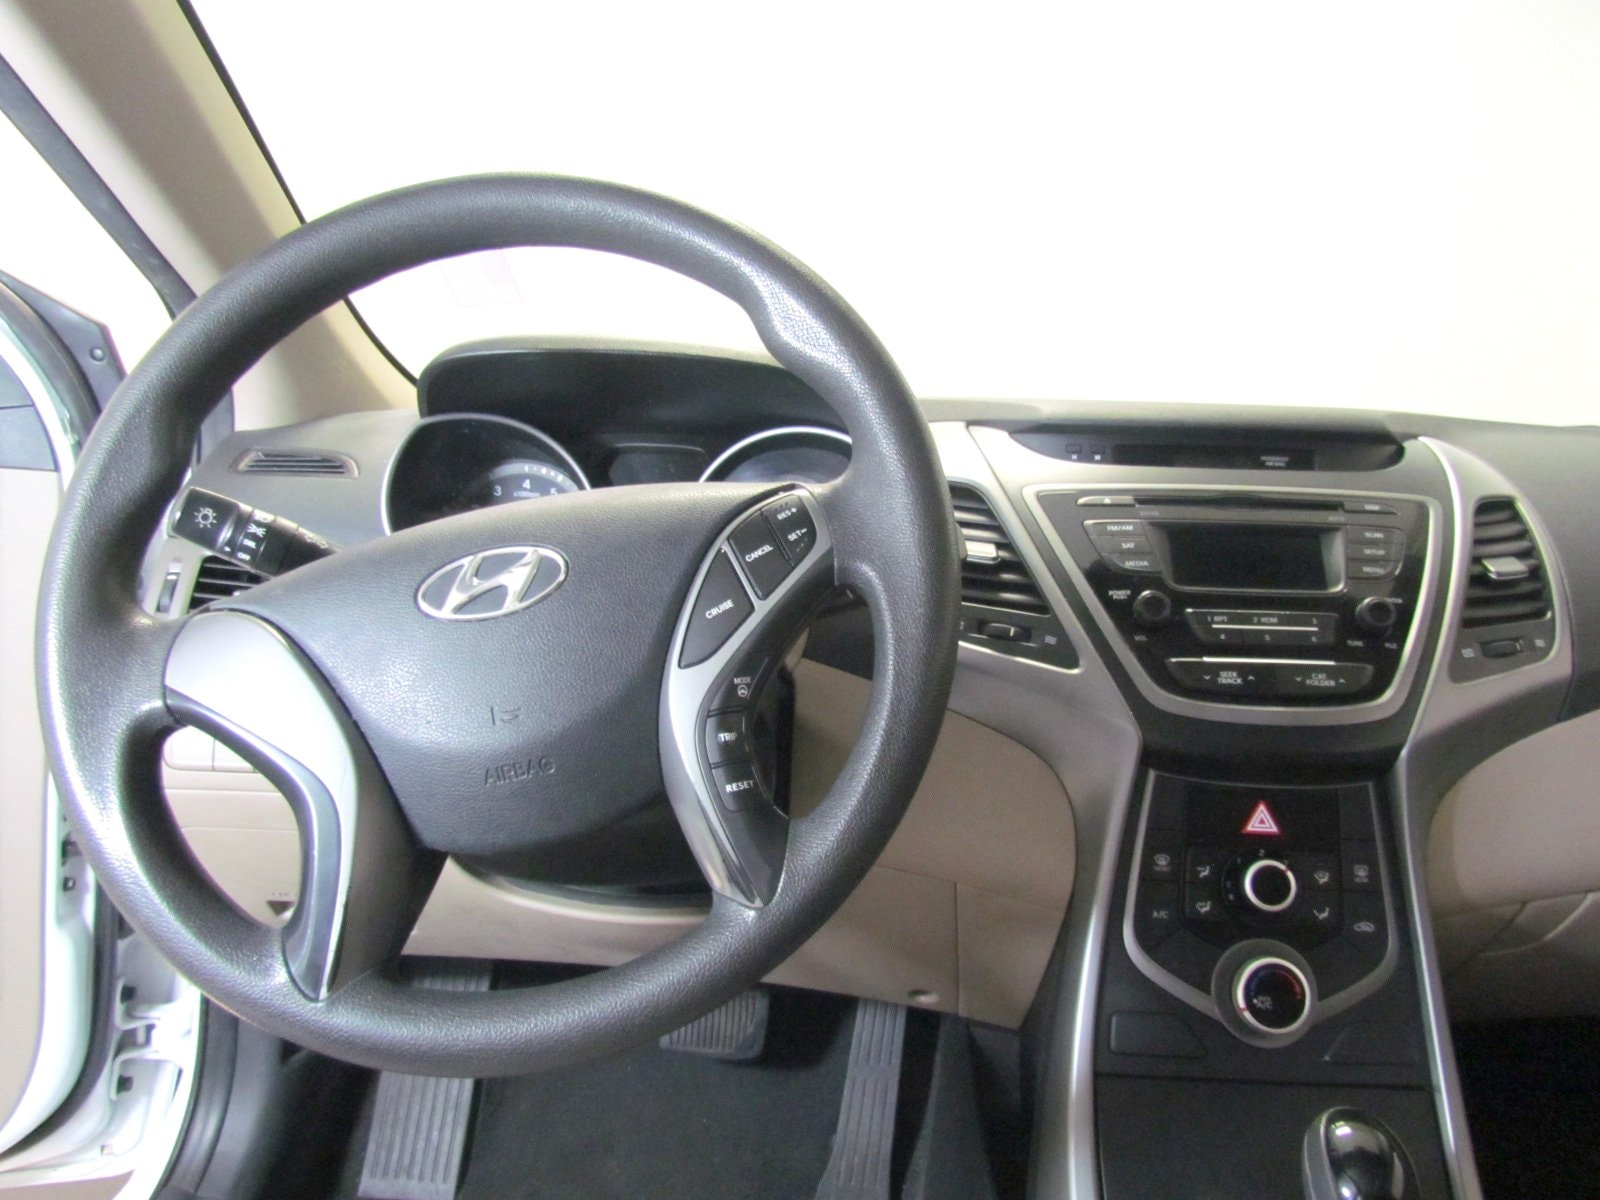 Used 2015 Hyundai Elantra For Sale at Hendrick Lexus Kansas